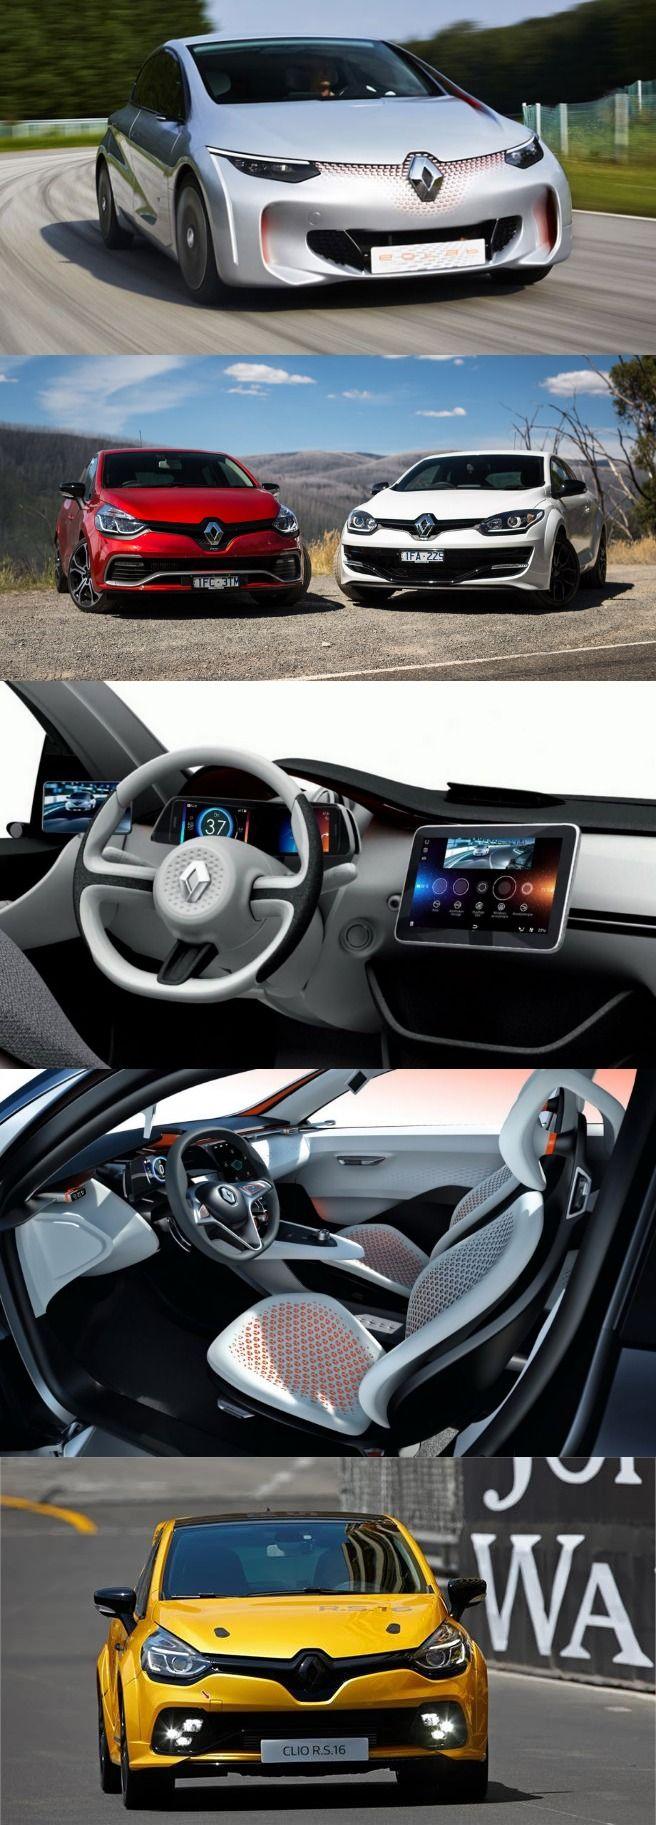 Renault Clio to Introduce with Revolutionary Interior Design.